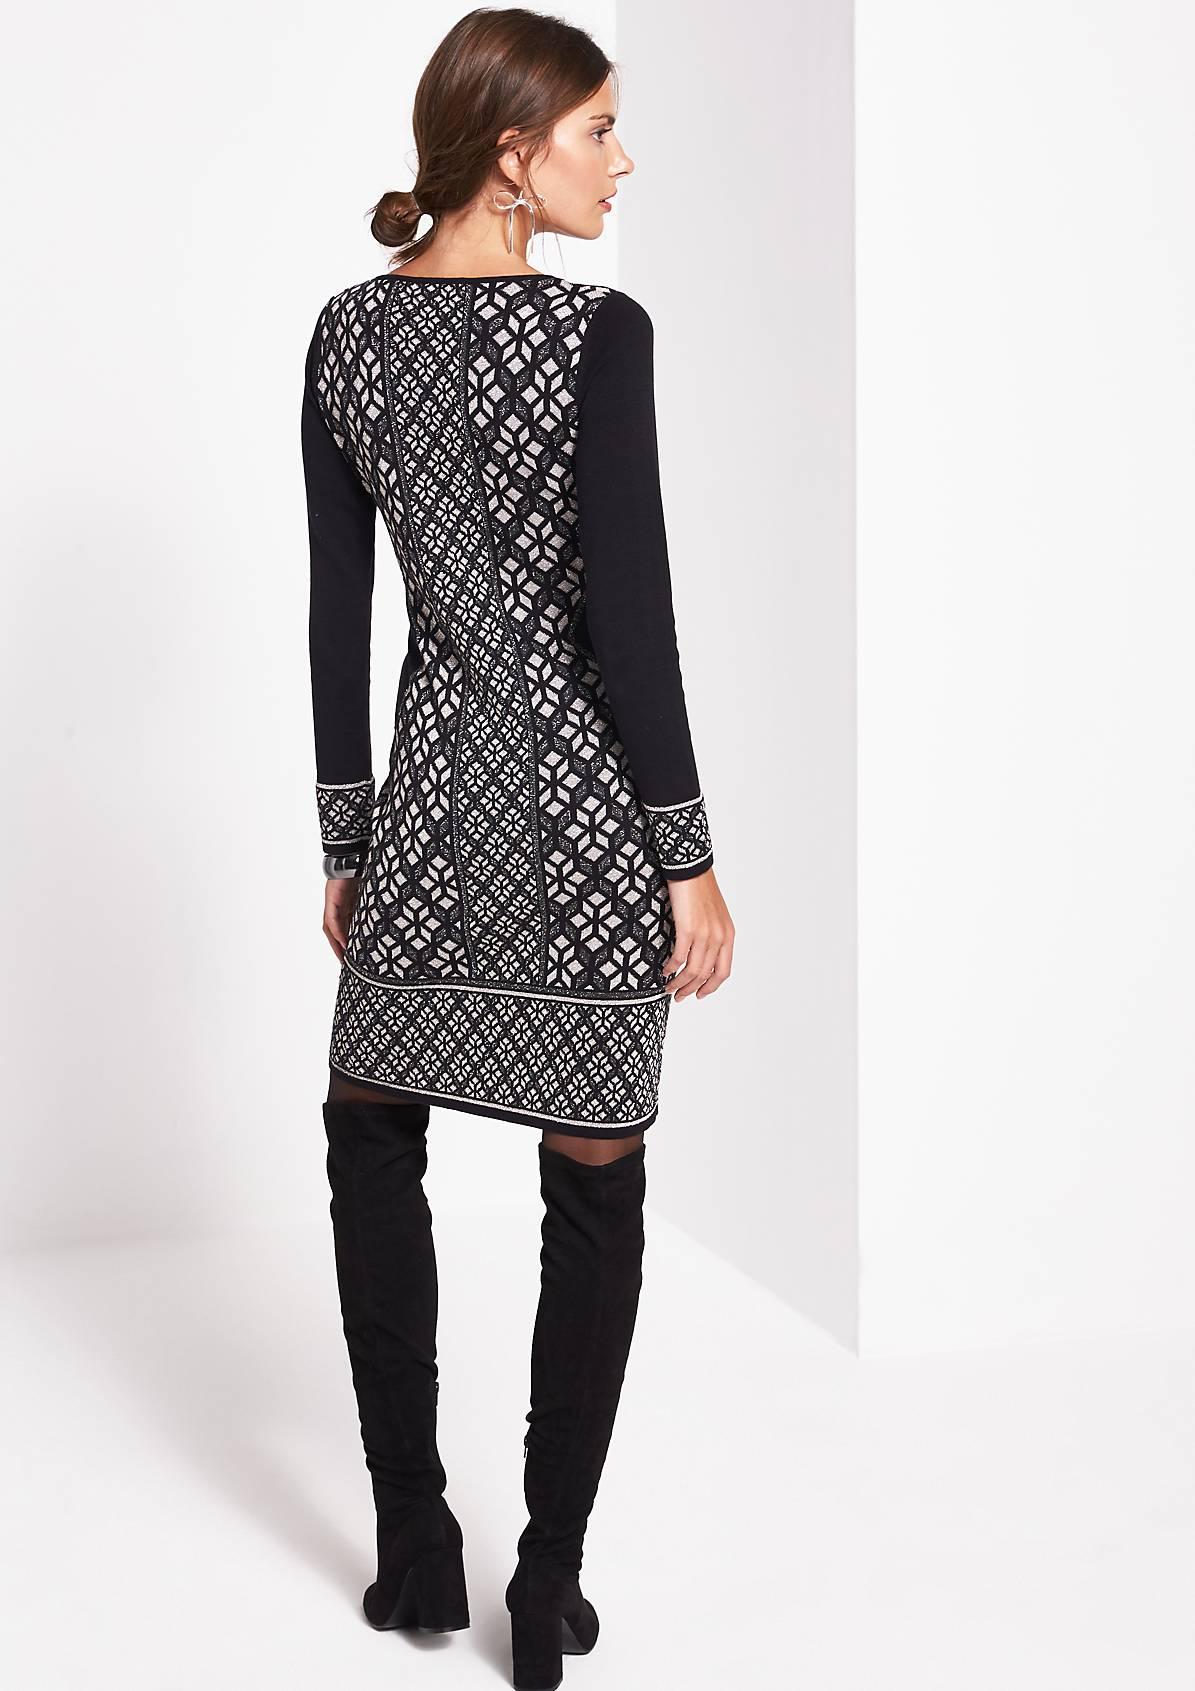 81.712.82.4137 Abendkleid | Fashion & Mode | comma Online-Store